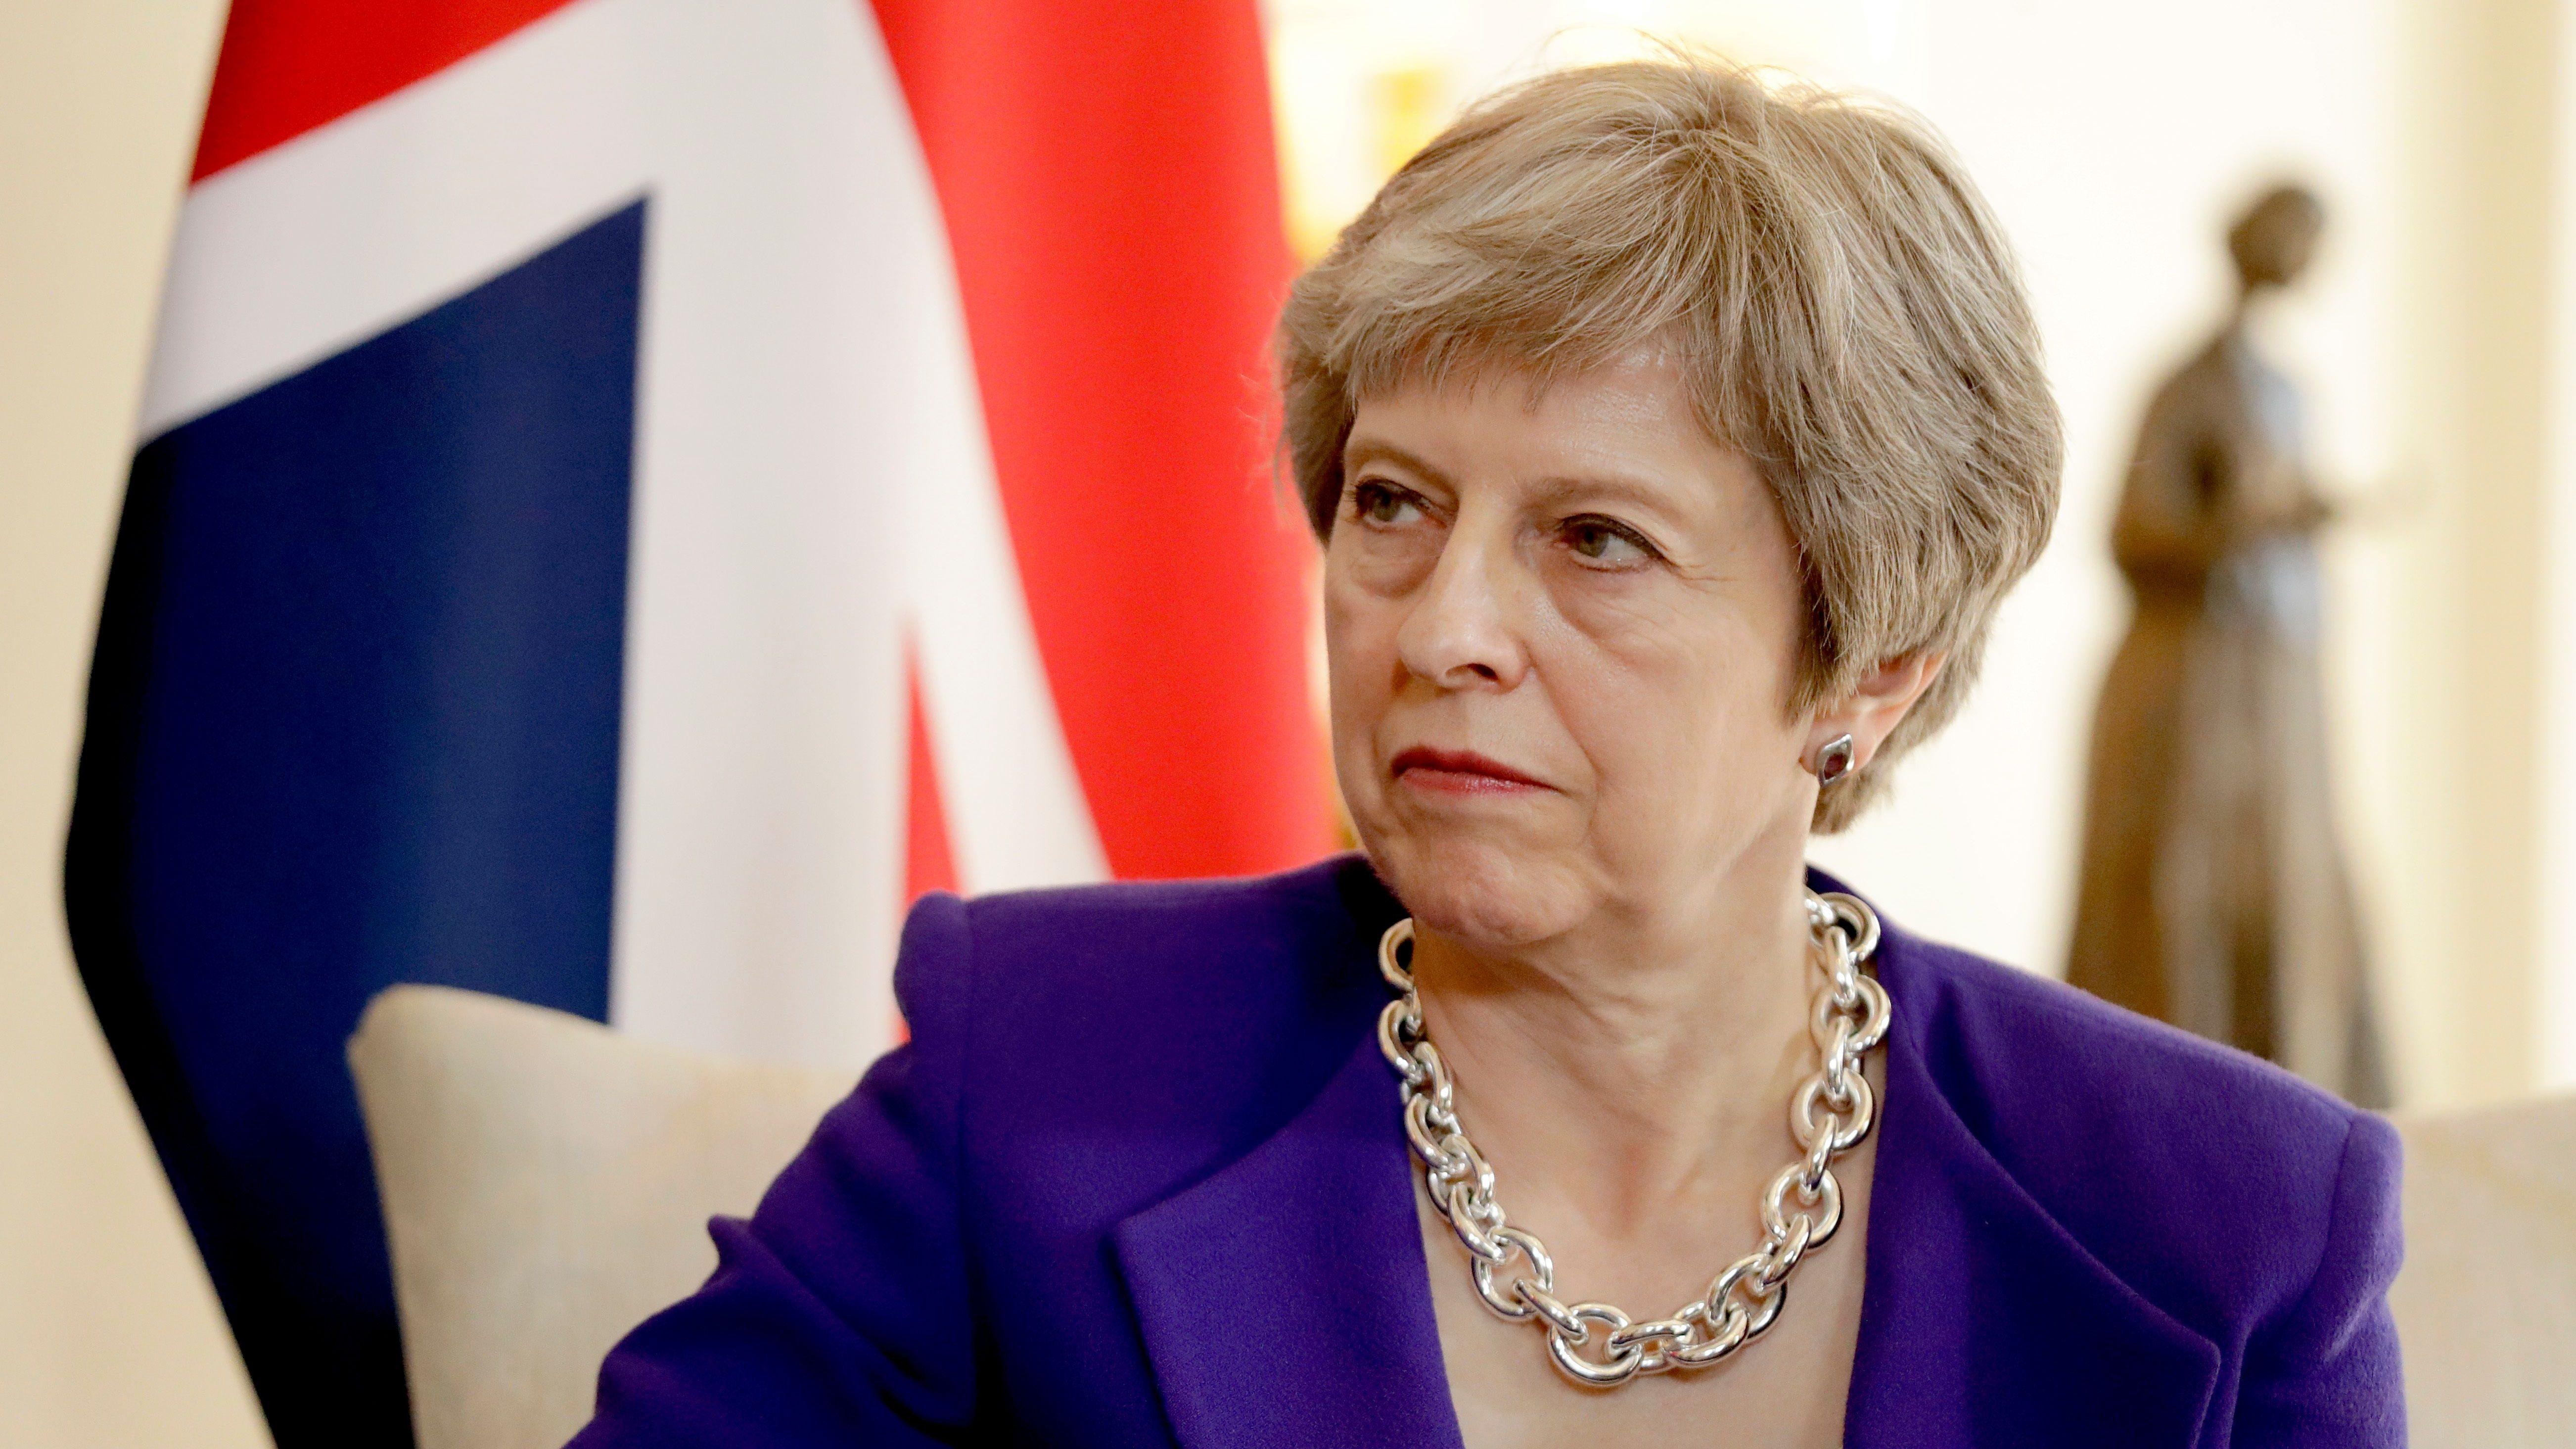 British Prime Minister Theresa May